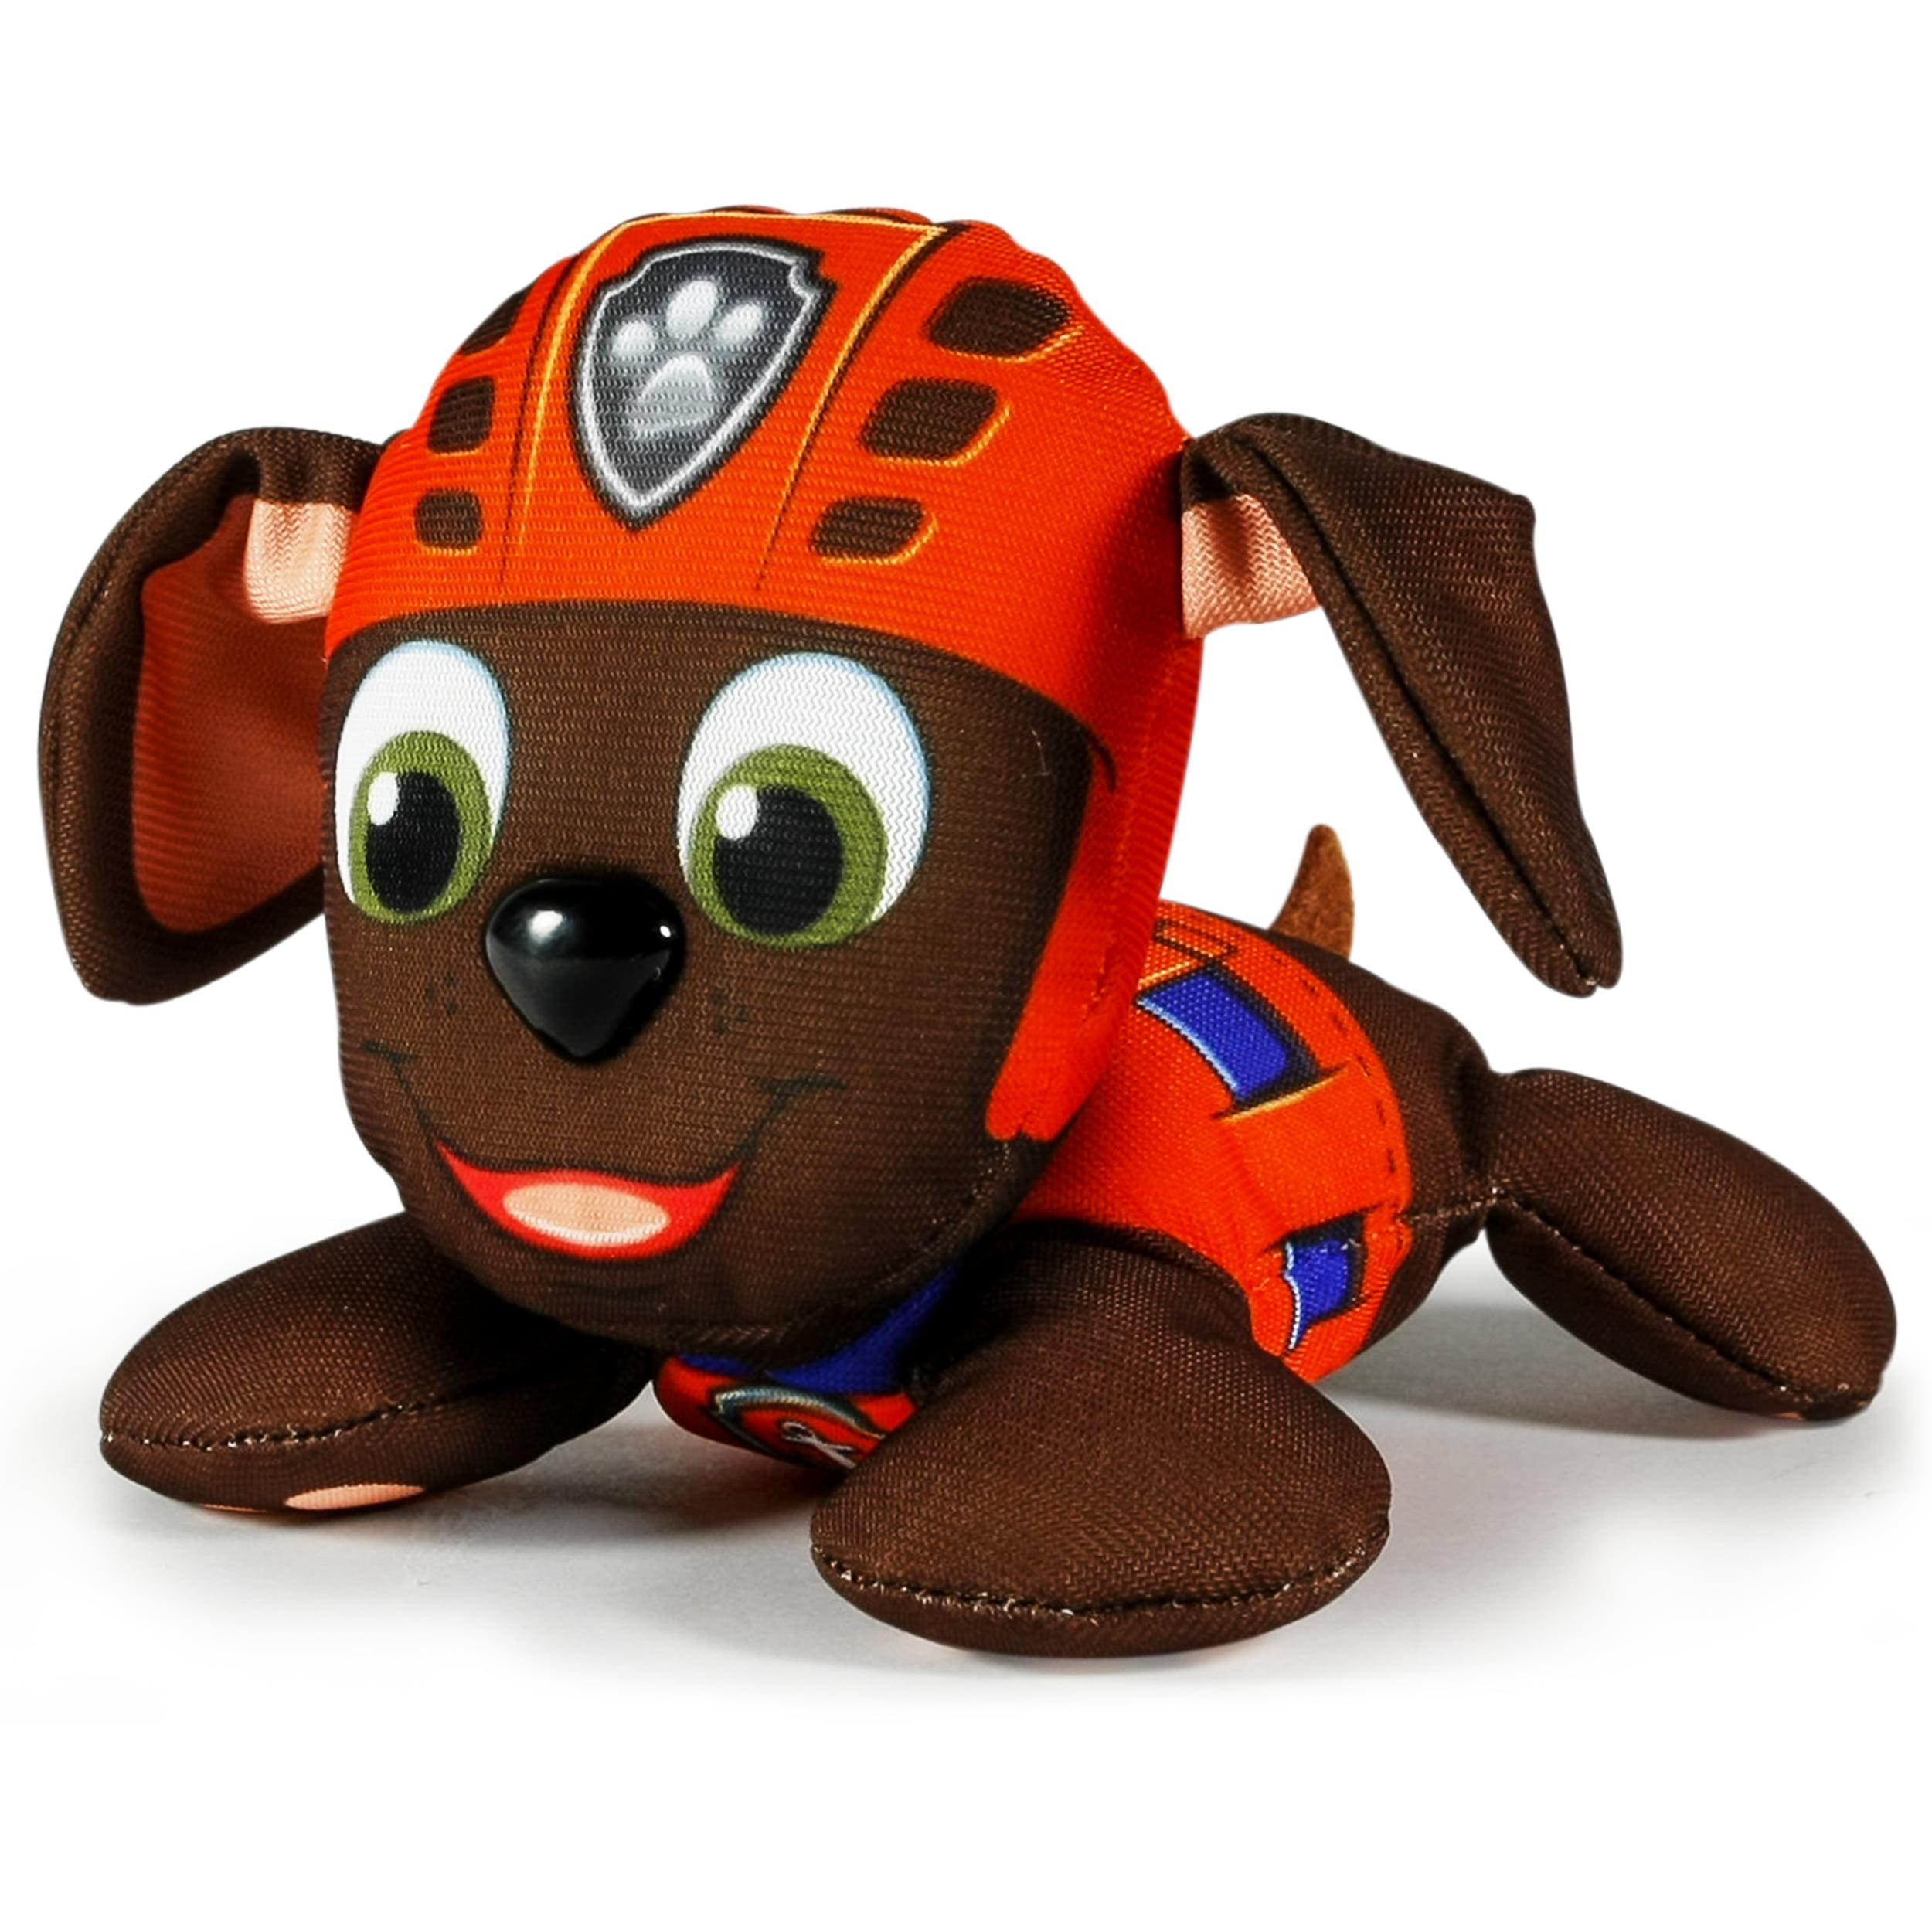 Paw Patrol Plush Pup Pals Zuma Spin Master 20069092-6026844